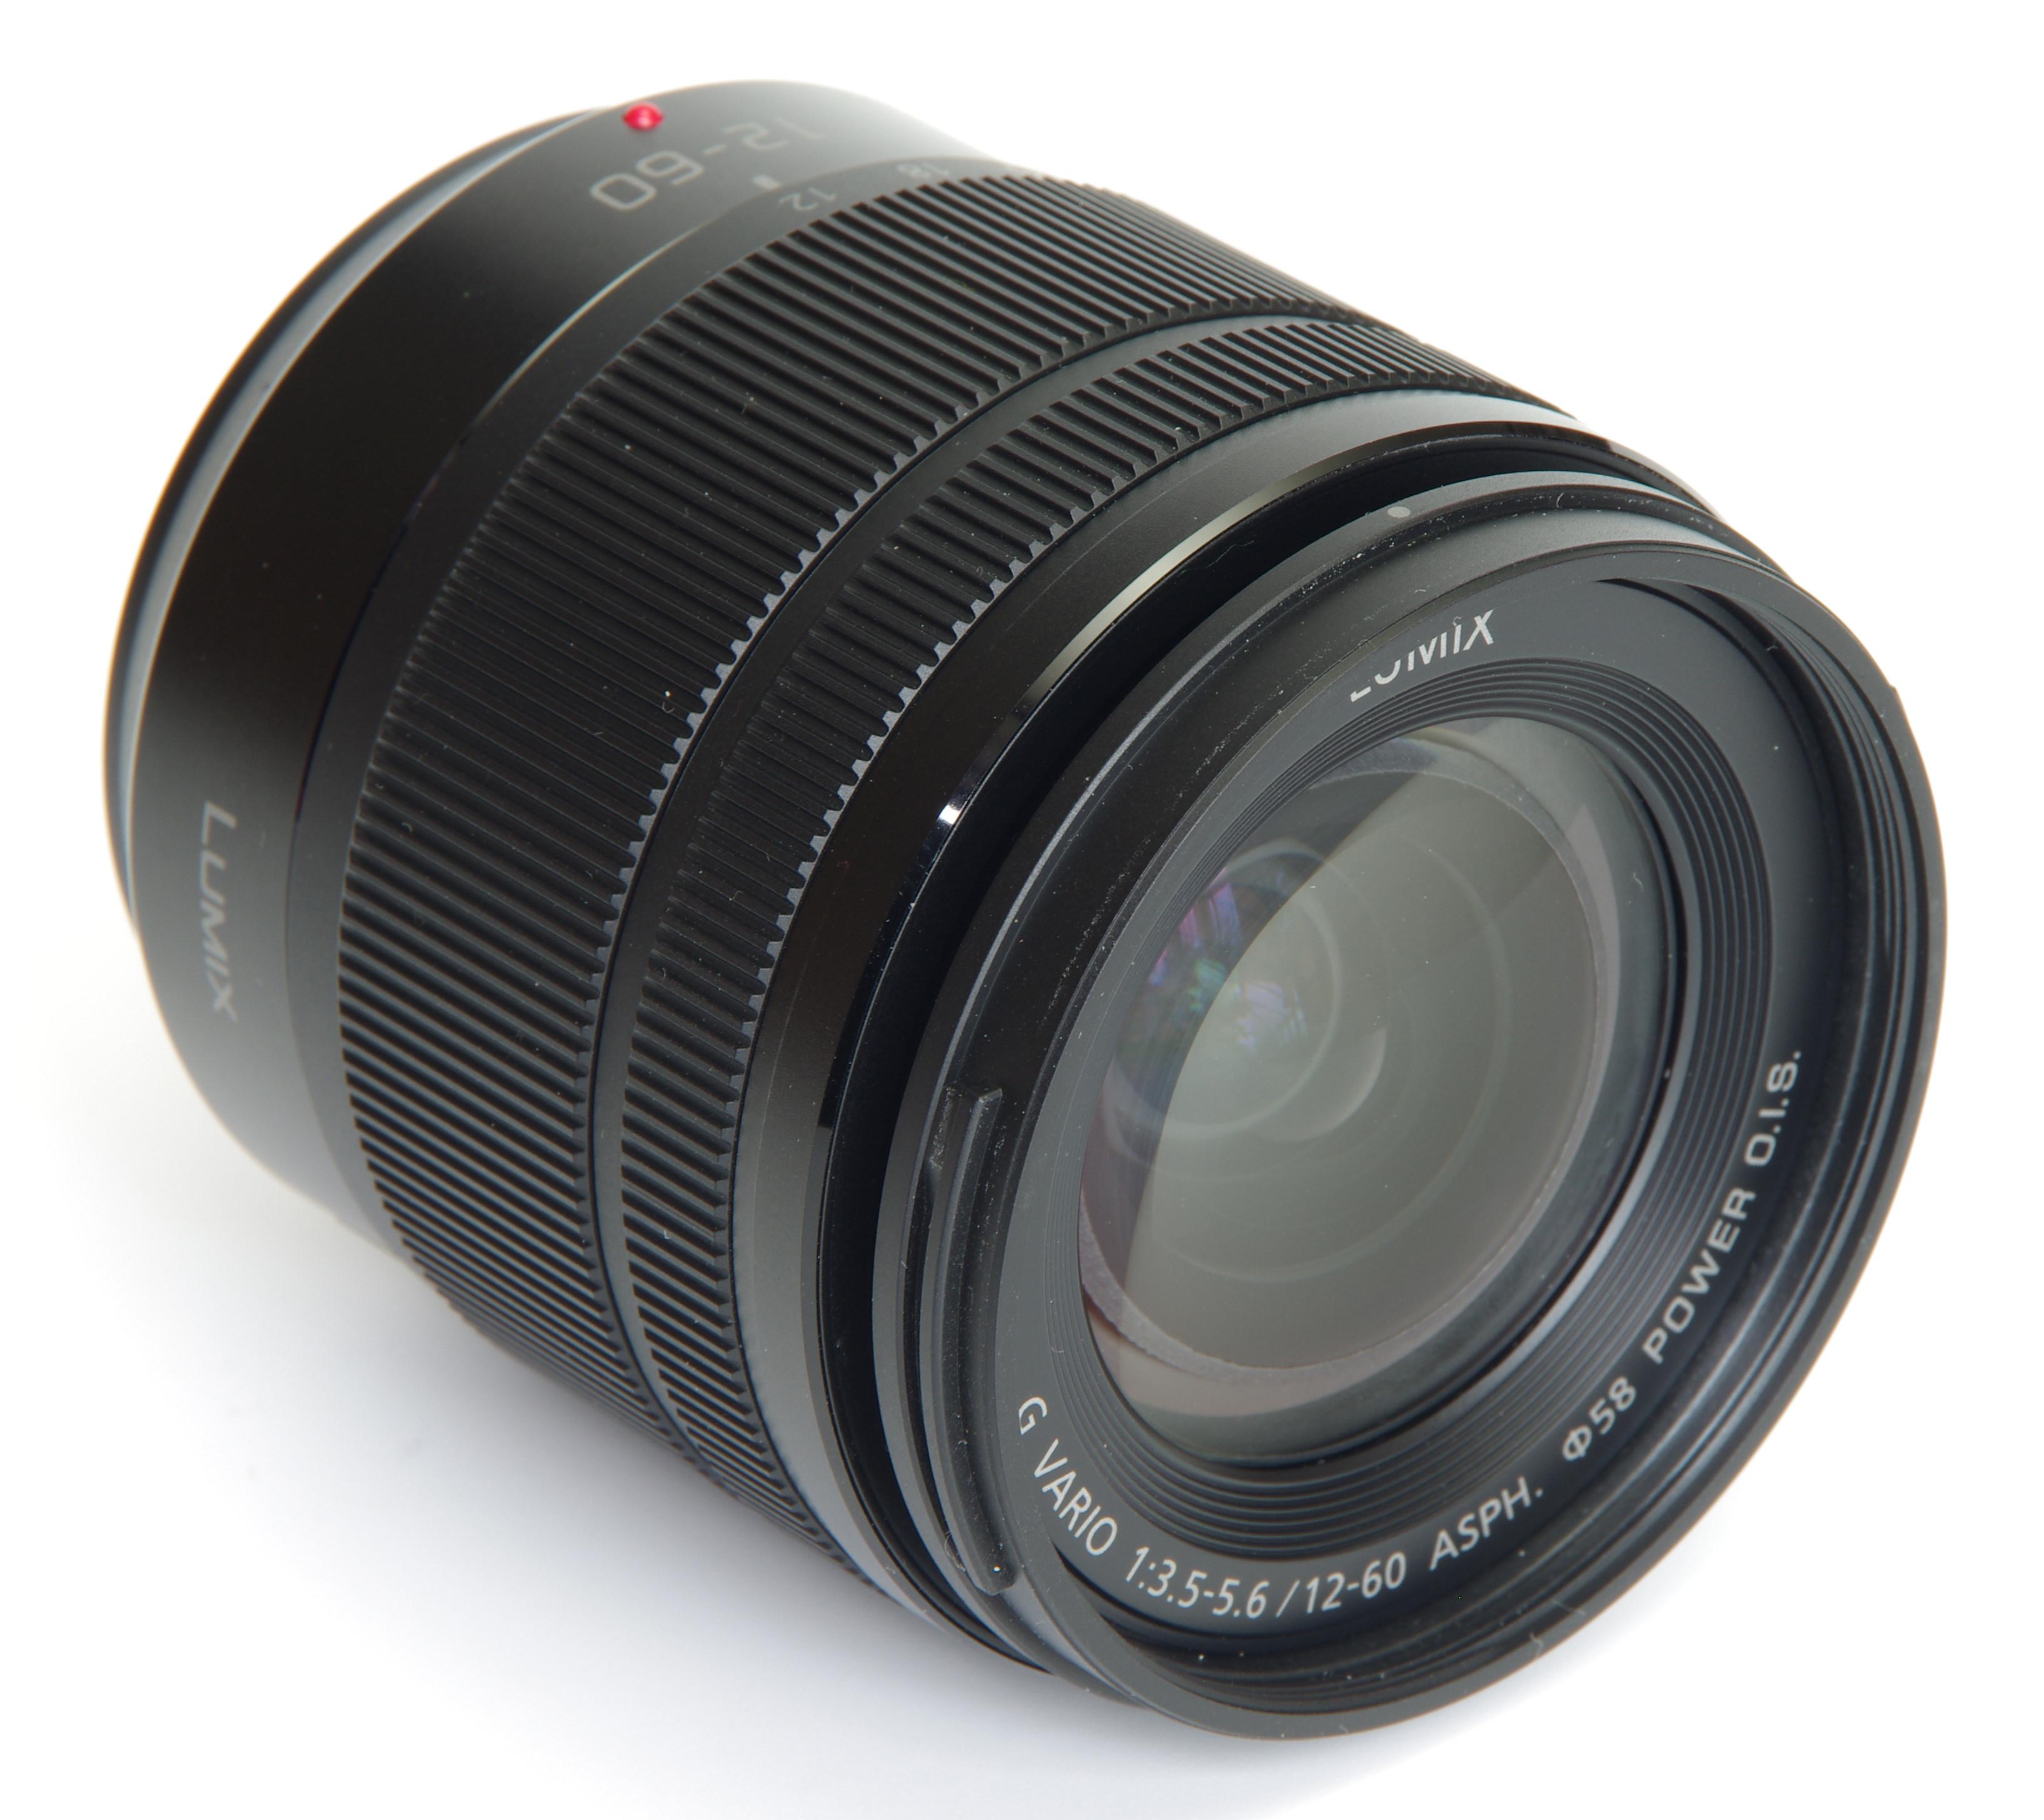 c0ab76eee6af Panasonic Lumix G Vario 12-60mm f/3.5-5.6 Asph. Power O.I.S. Review ...